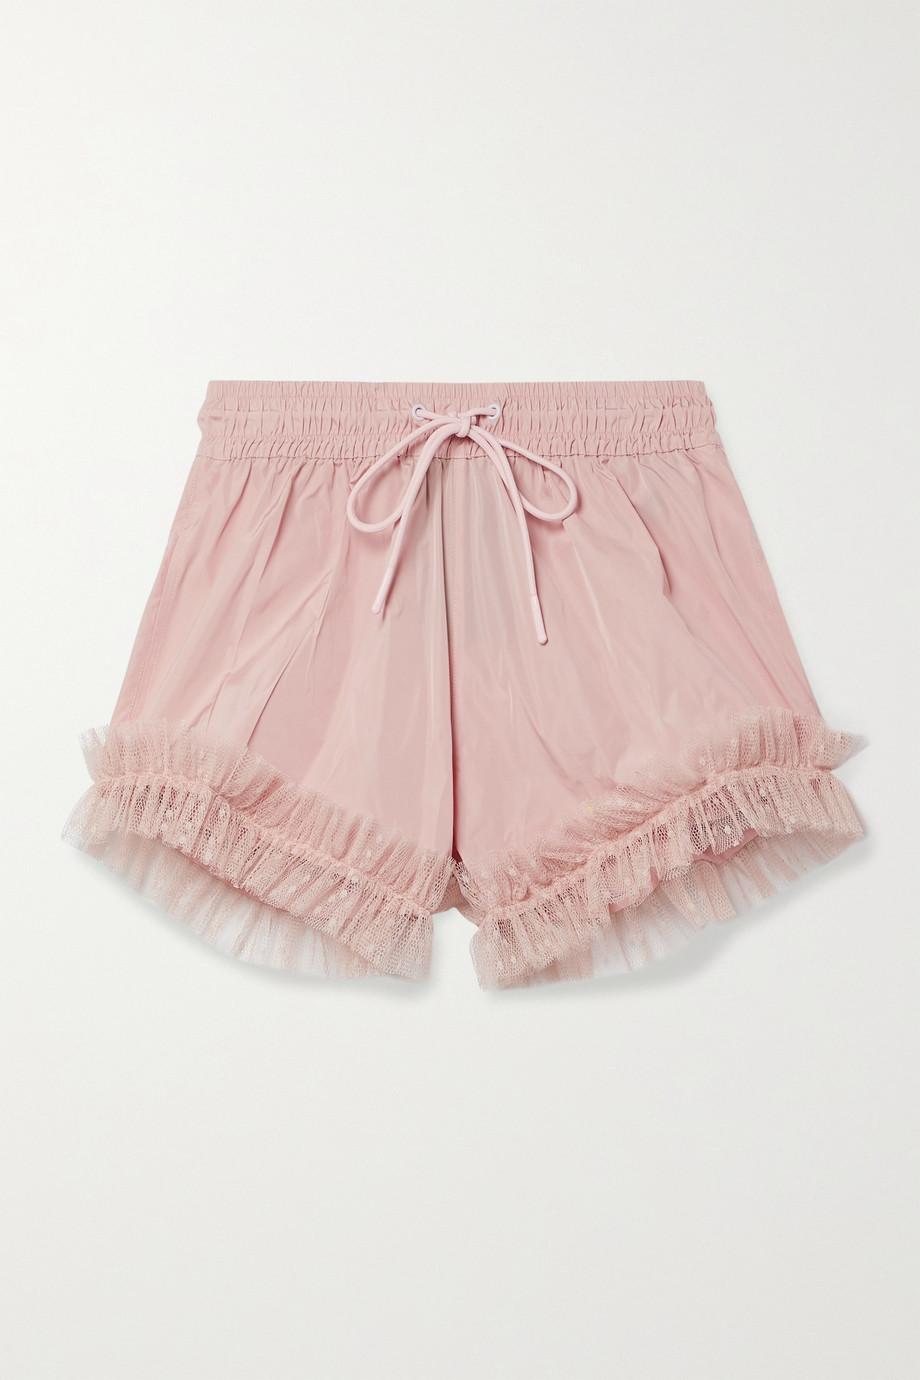 REDValentino Ruffled point d'esprit tulle-trimmed taffeta shorts